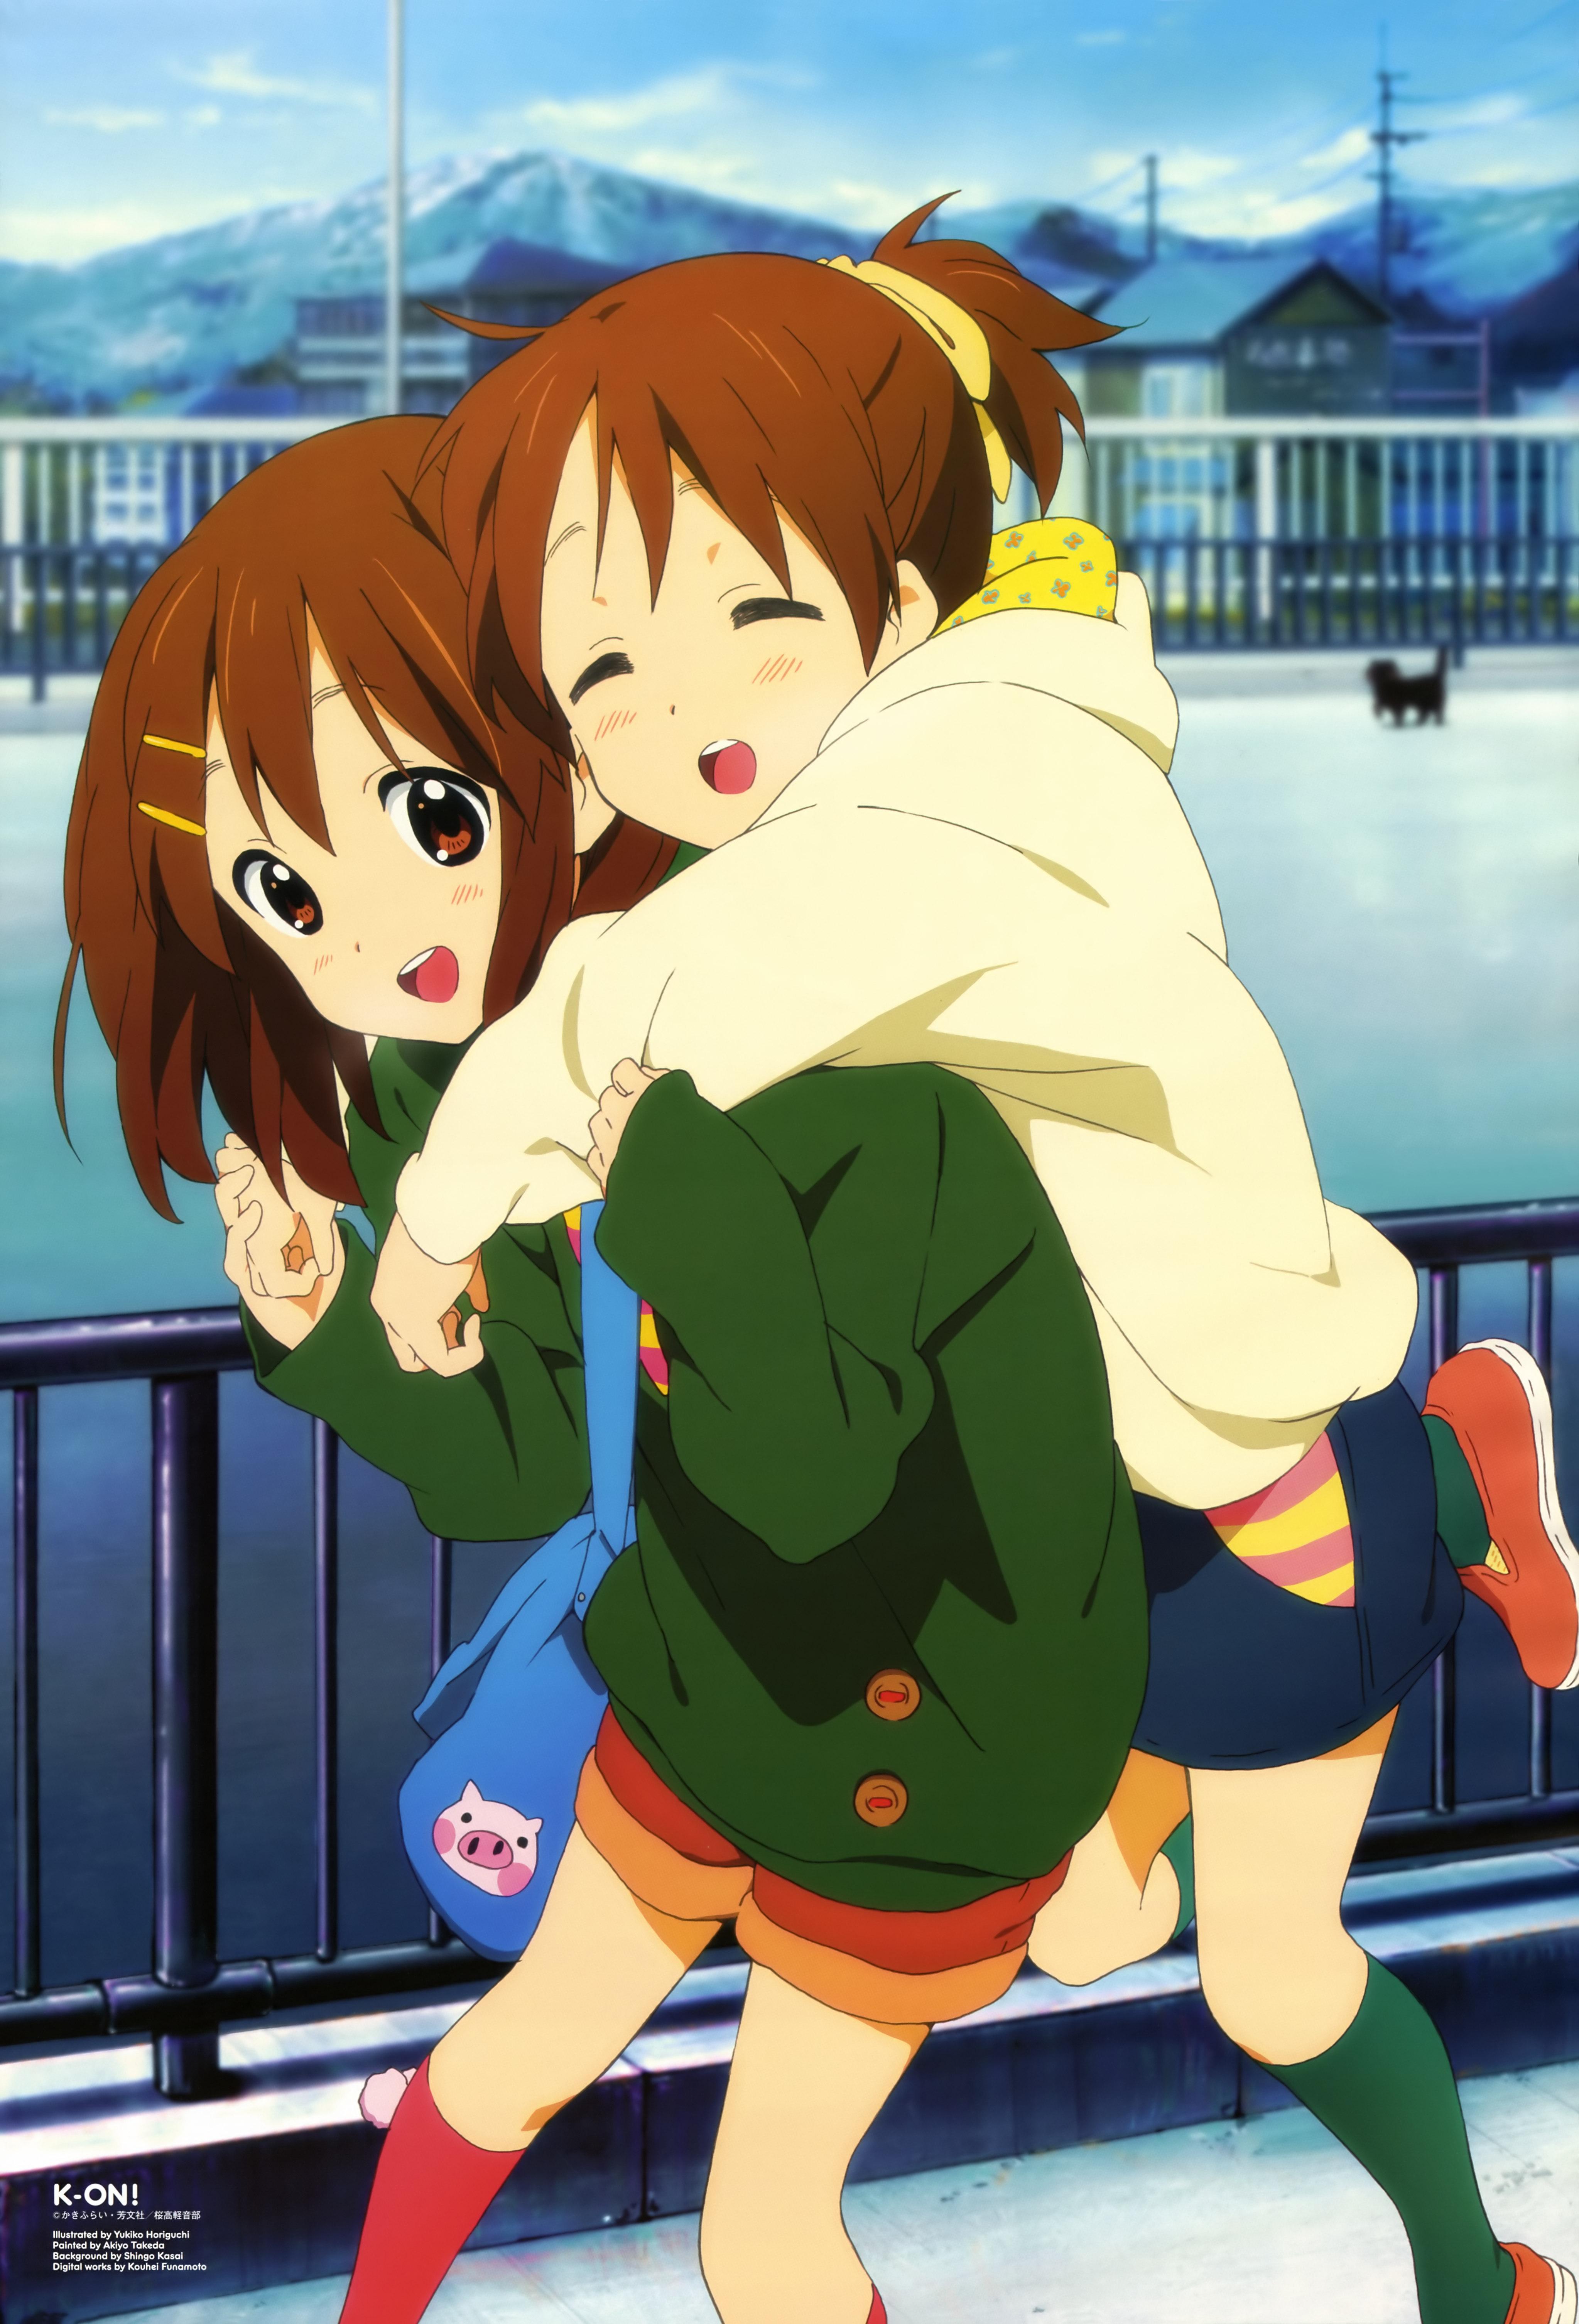 http://www.uplooder.net/img/image/4/bdf5dcca9ee6e1591c7acf2ac64f12a2/Ui-hugging-Yui.jpg